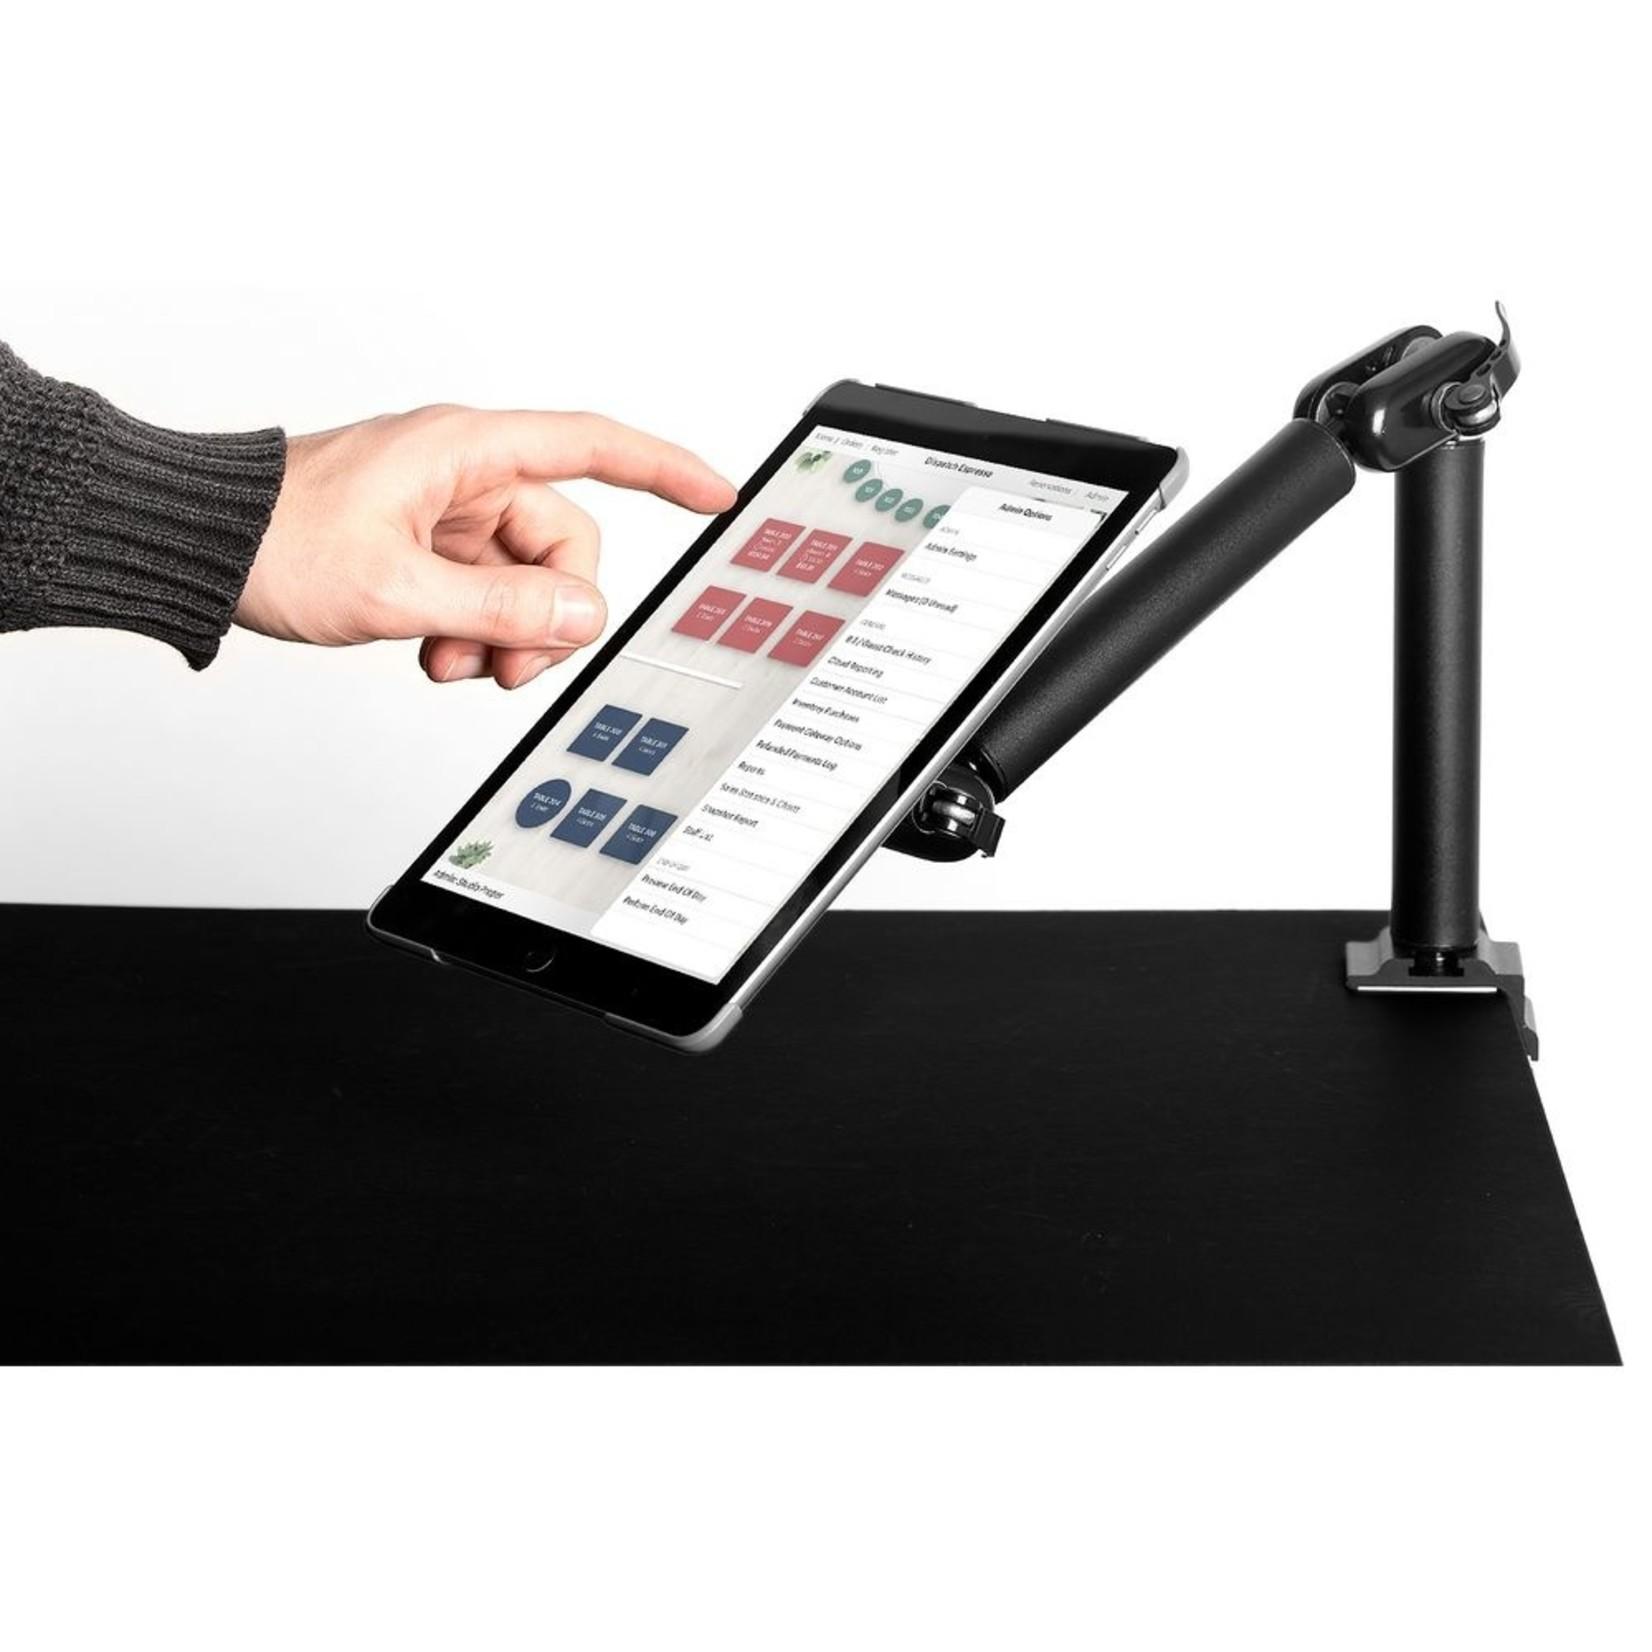 Studio Proper PRE ORDER Studio Proper iPad Connect Arm ETA Early August